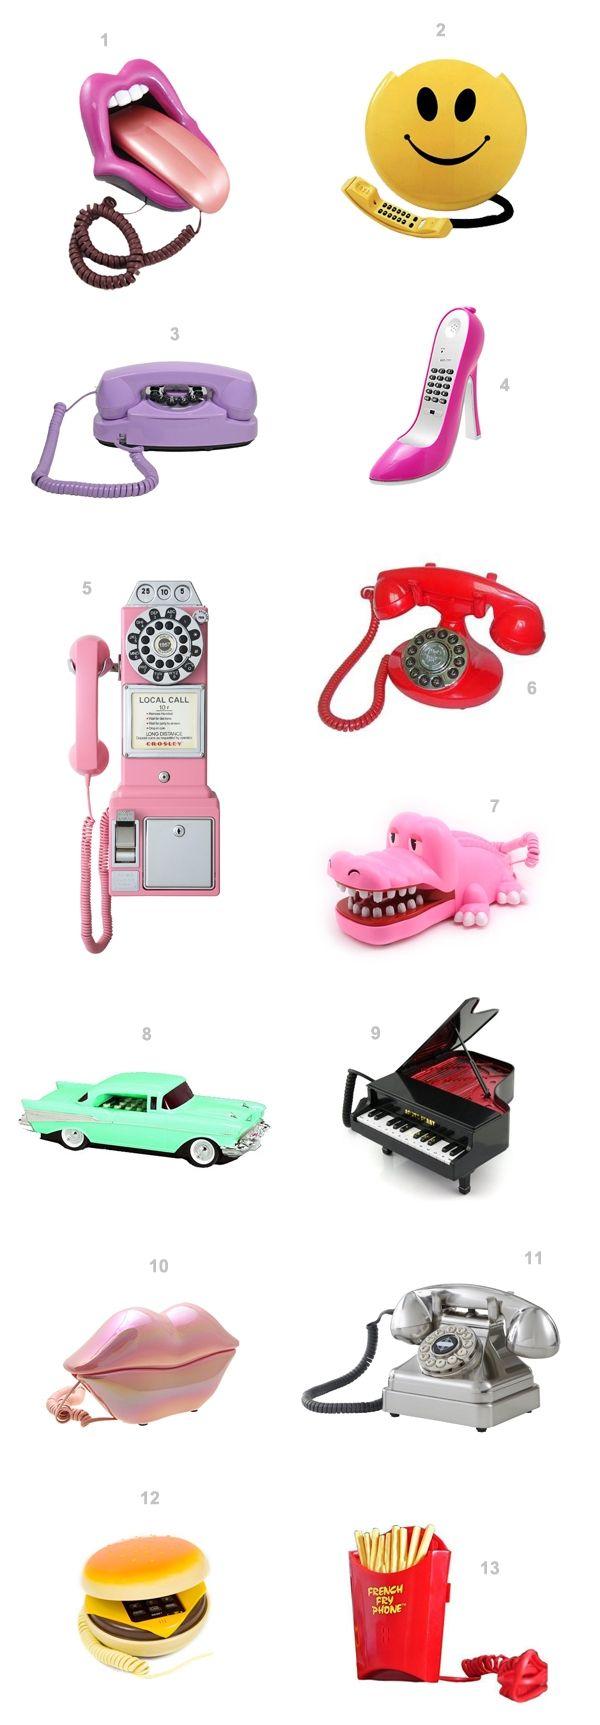 13 Novelty Phones You Probably Need | studiodiy.com